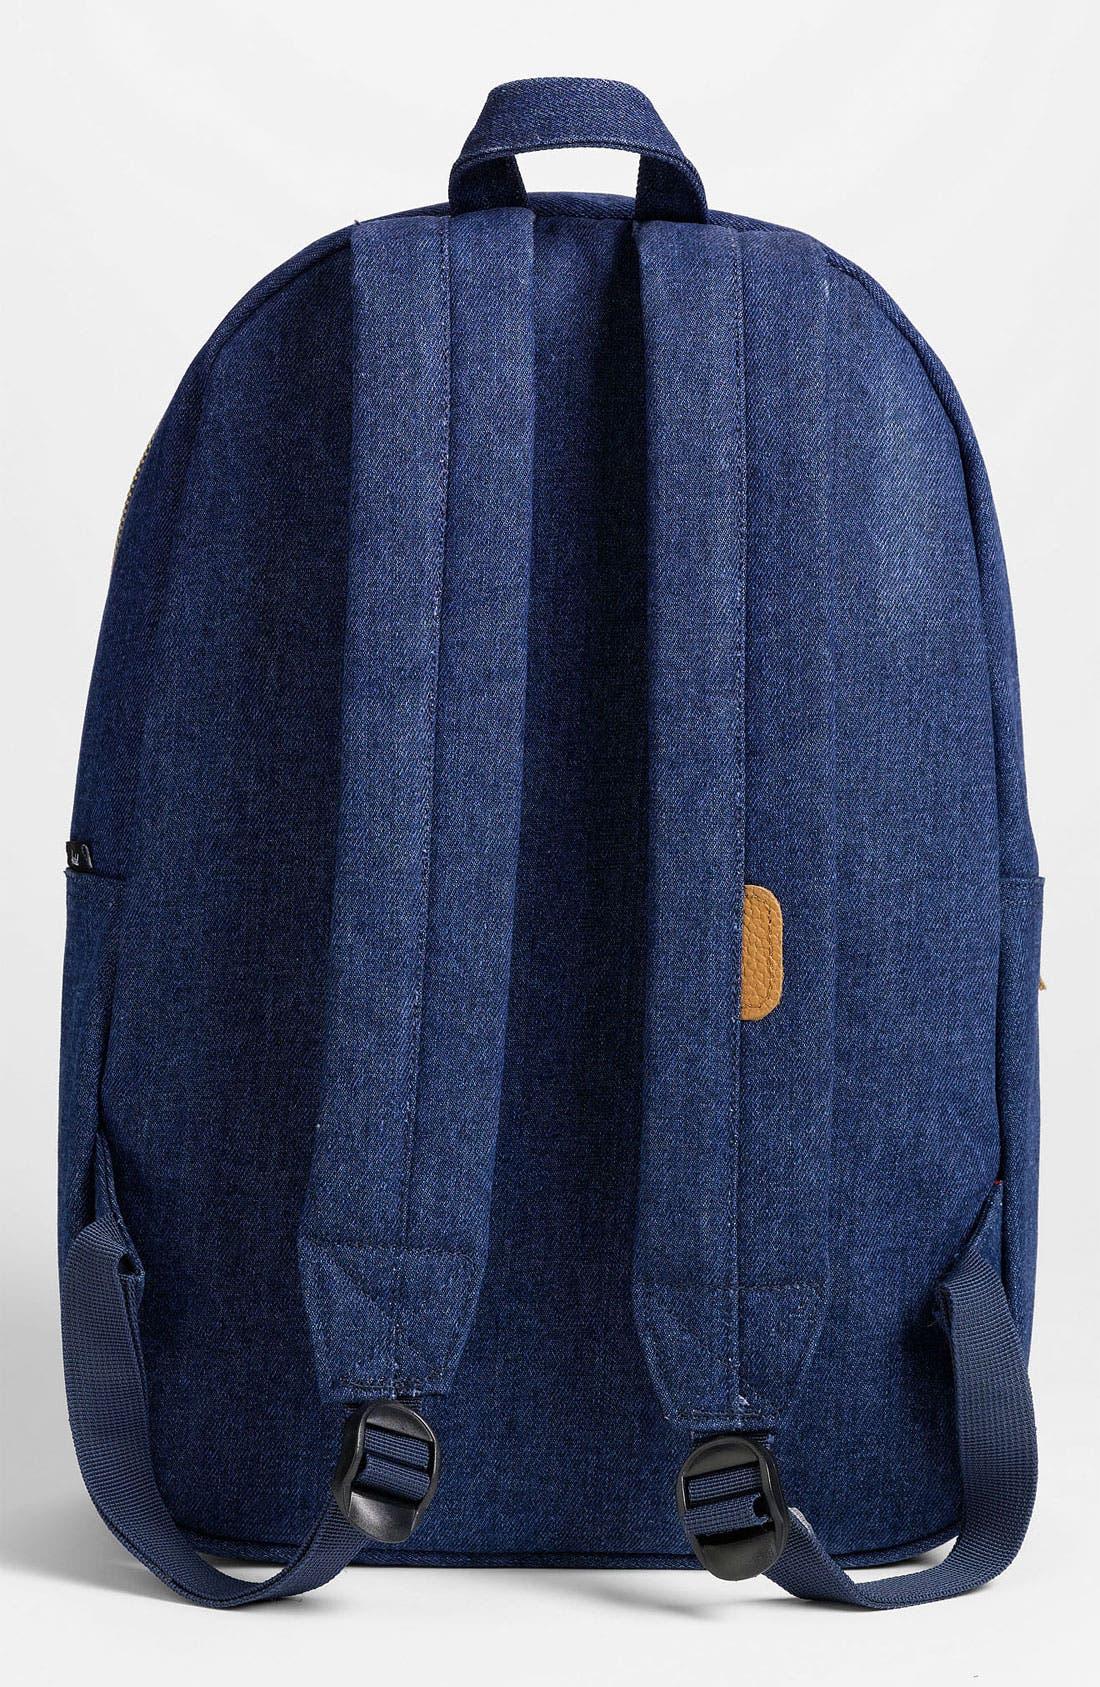 Alternate Image 2  - Herschel Supply Co. 'Settlement - Denim Collection' Backpack